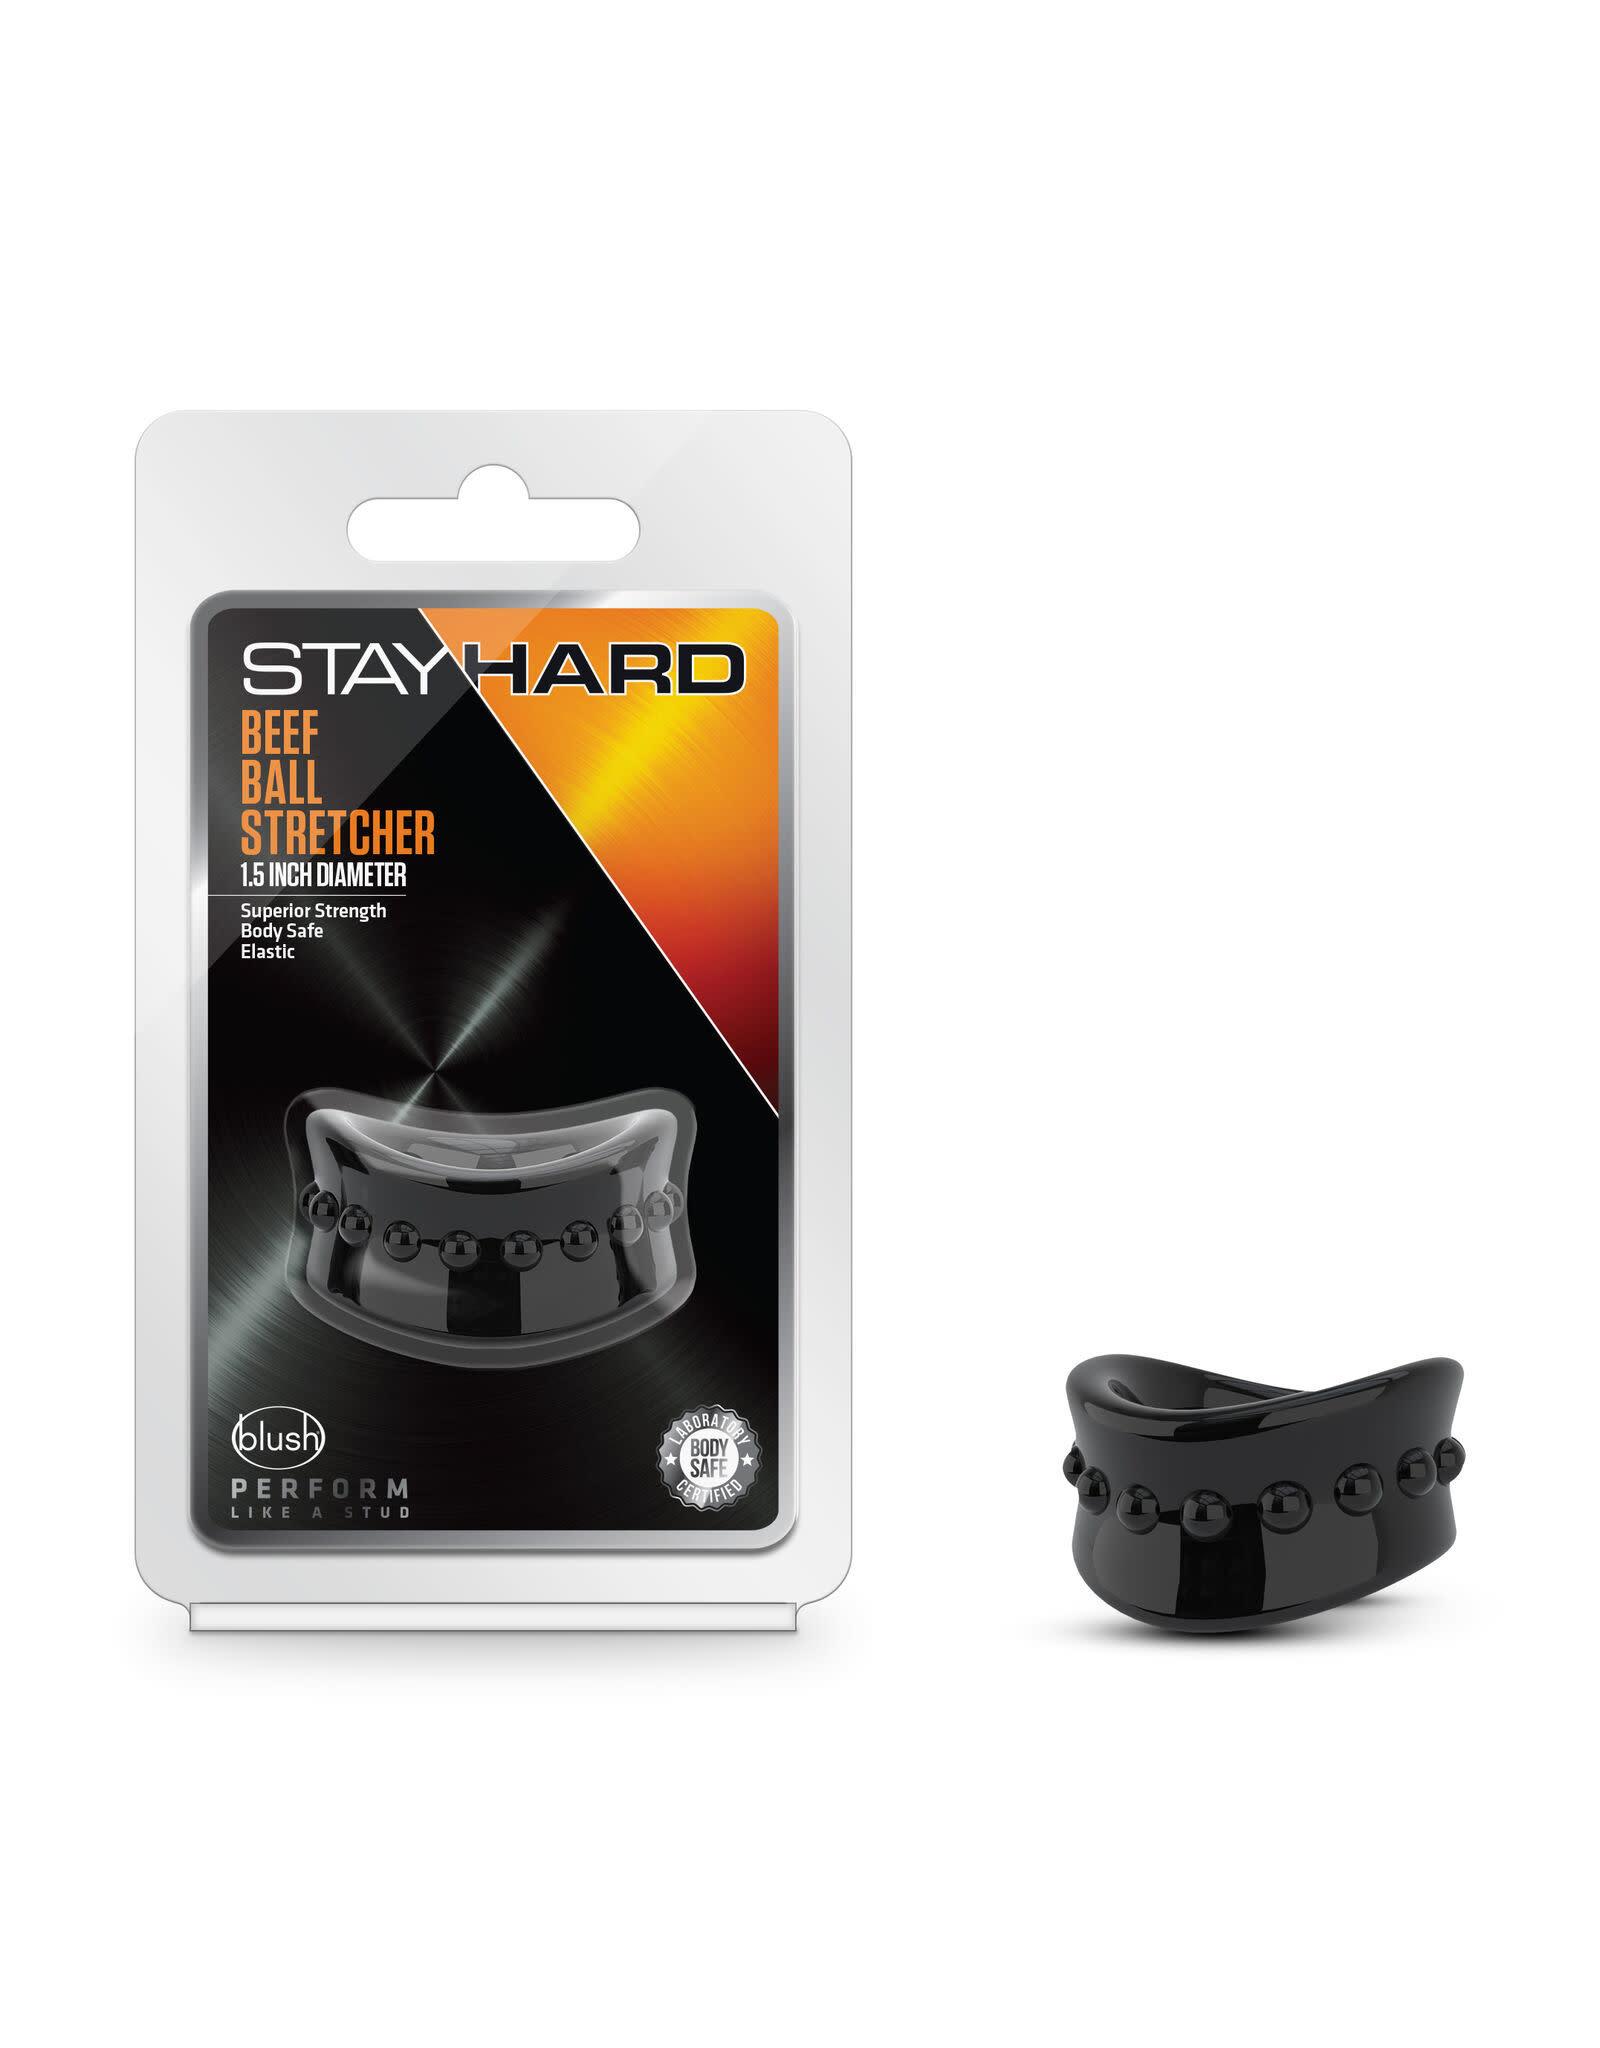 STAY HARD - BEEF BALL STRETCHER - 1.5 INCH DIAMETER - BLACK